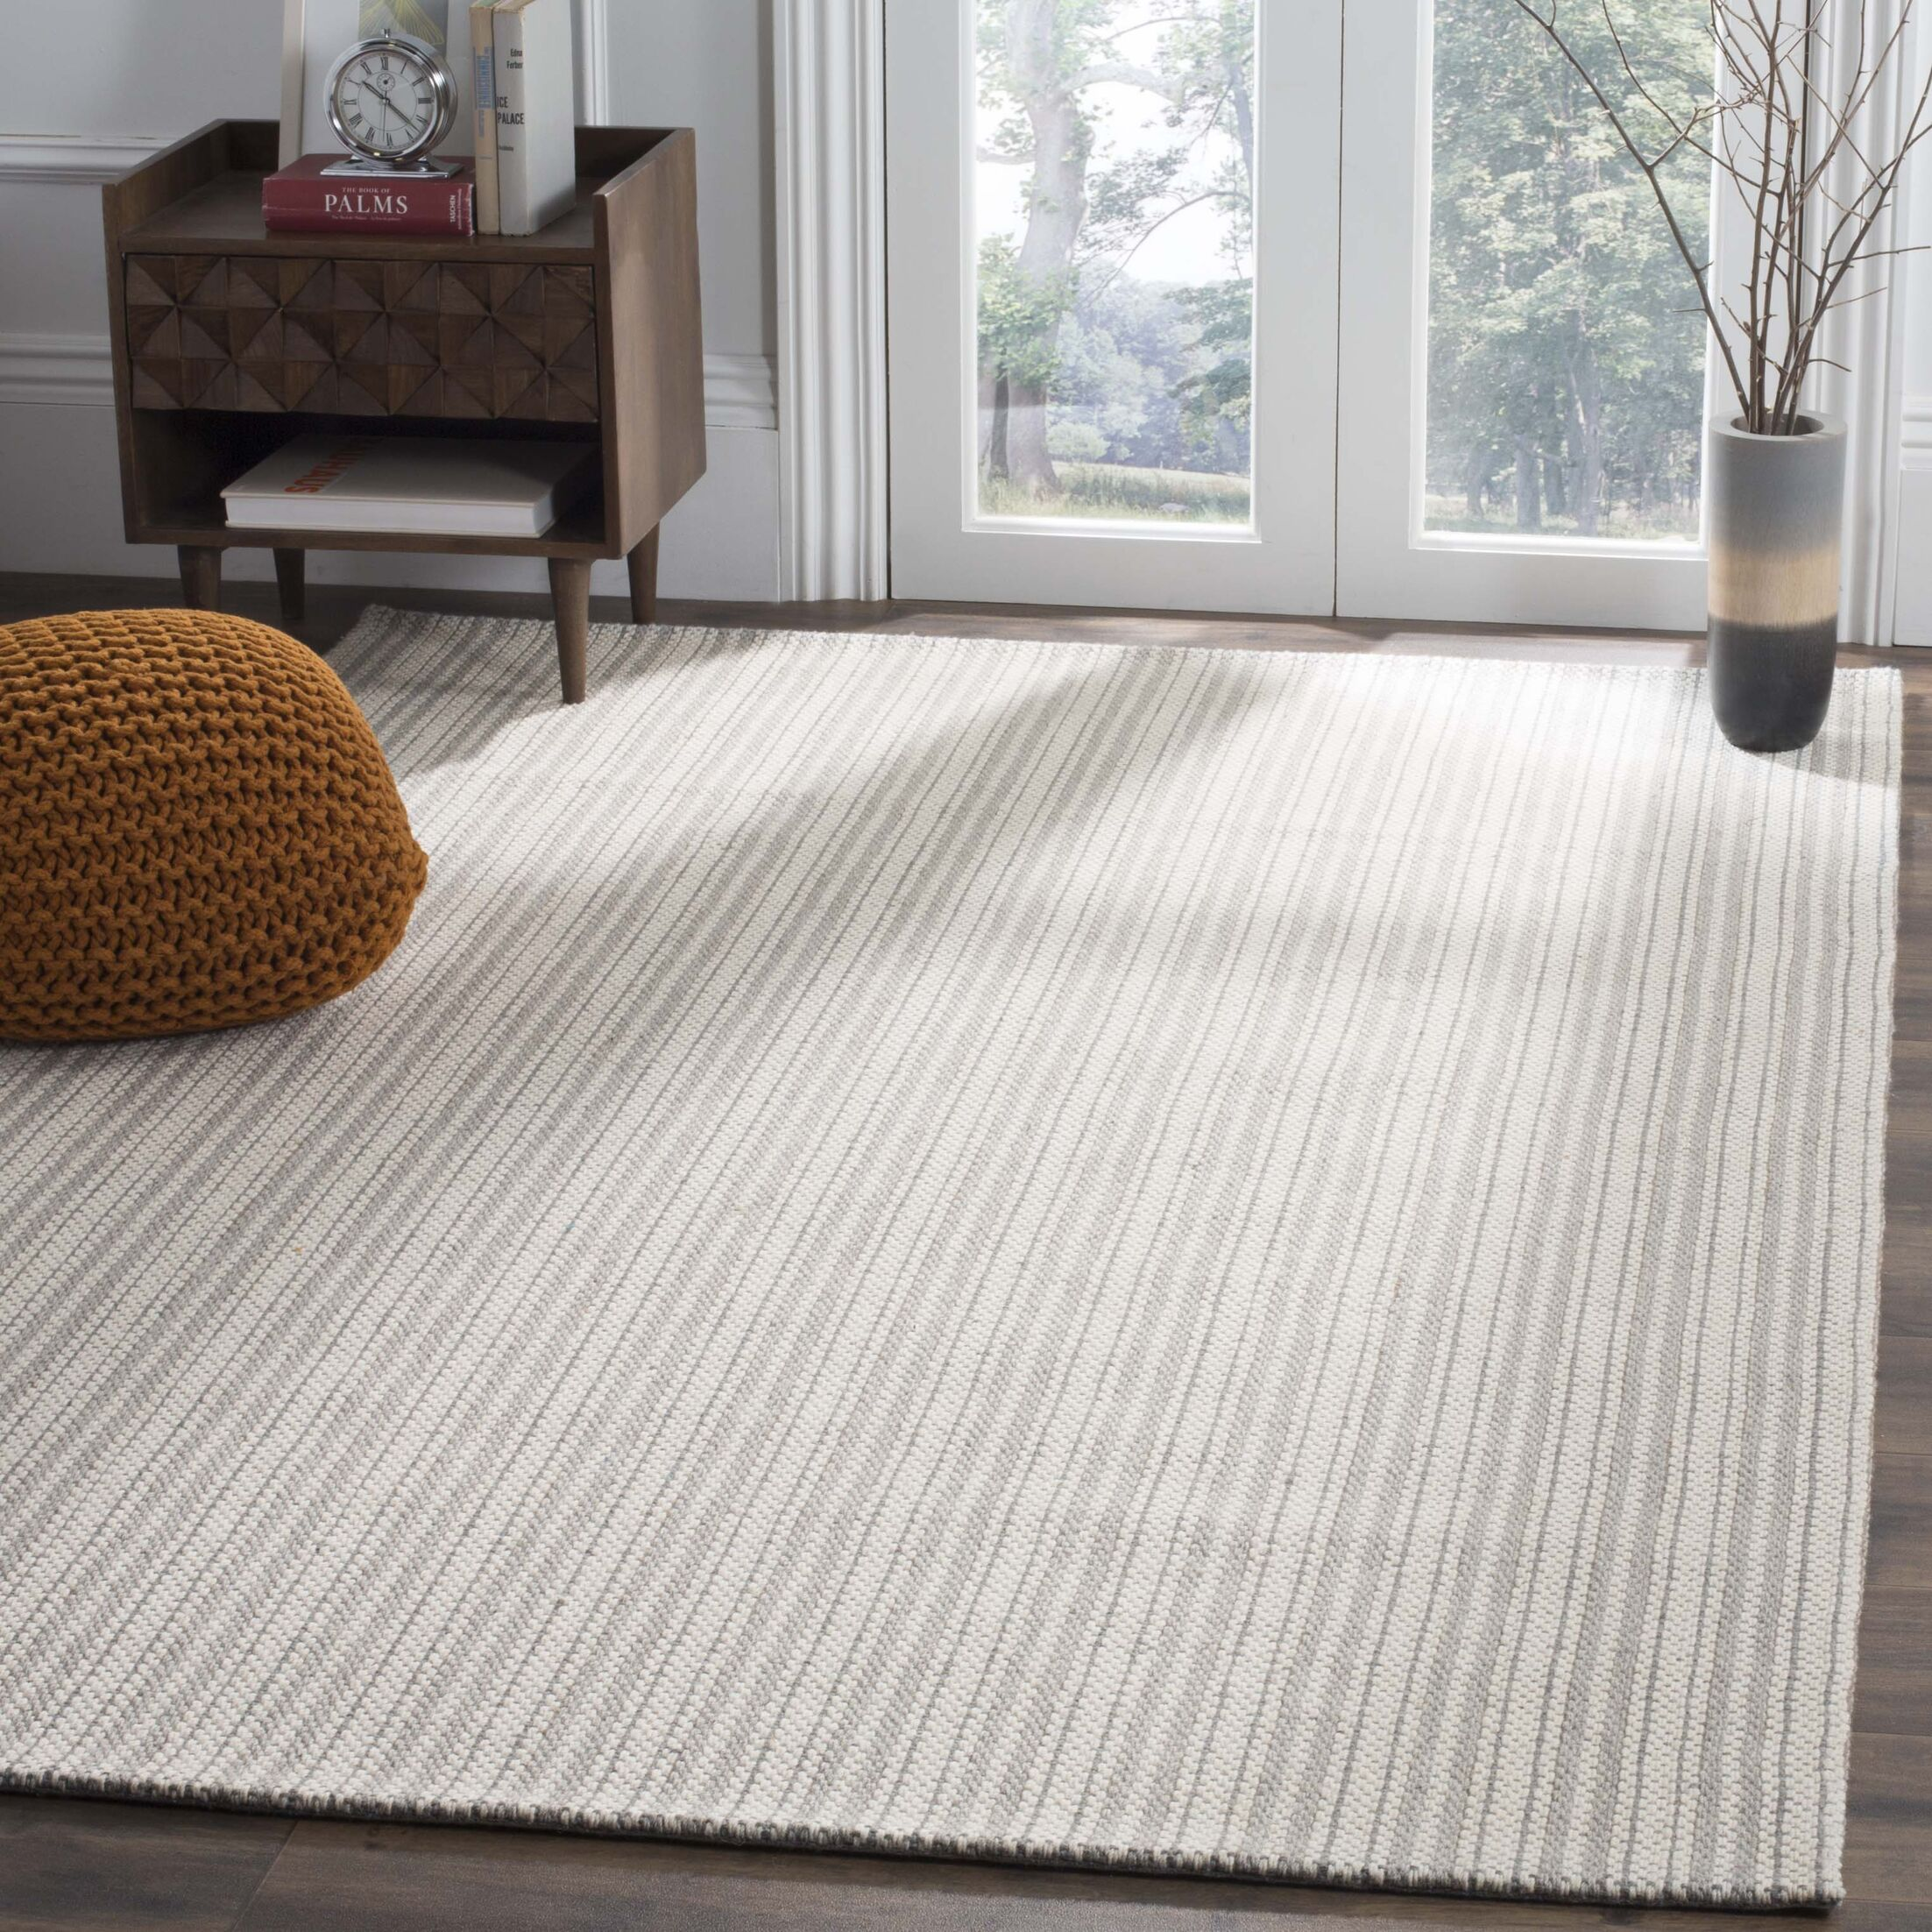 Cherif Hand Tufted Gray Area Rug Rug Size: Rectangle 4' x 6'